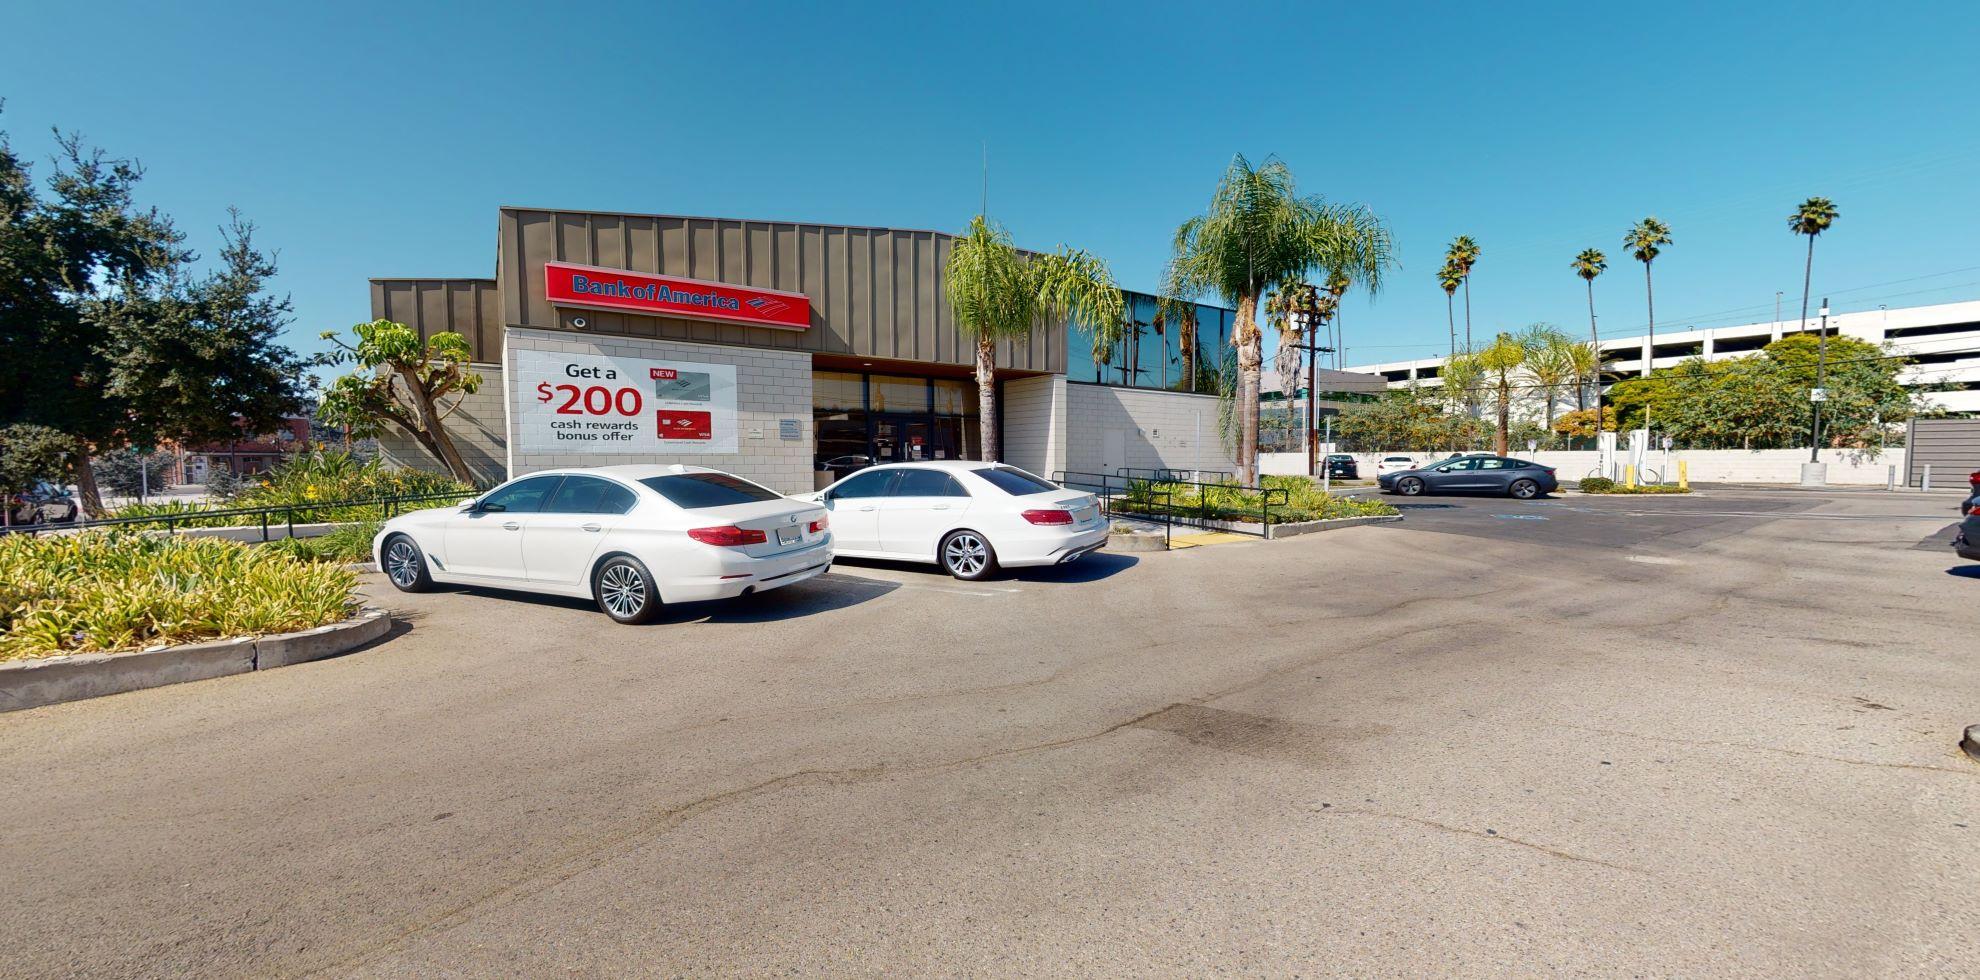 Bank of America financial center with drive-thru ATM   3812 San Fernando Rd, Glendale, CA 91204